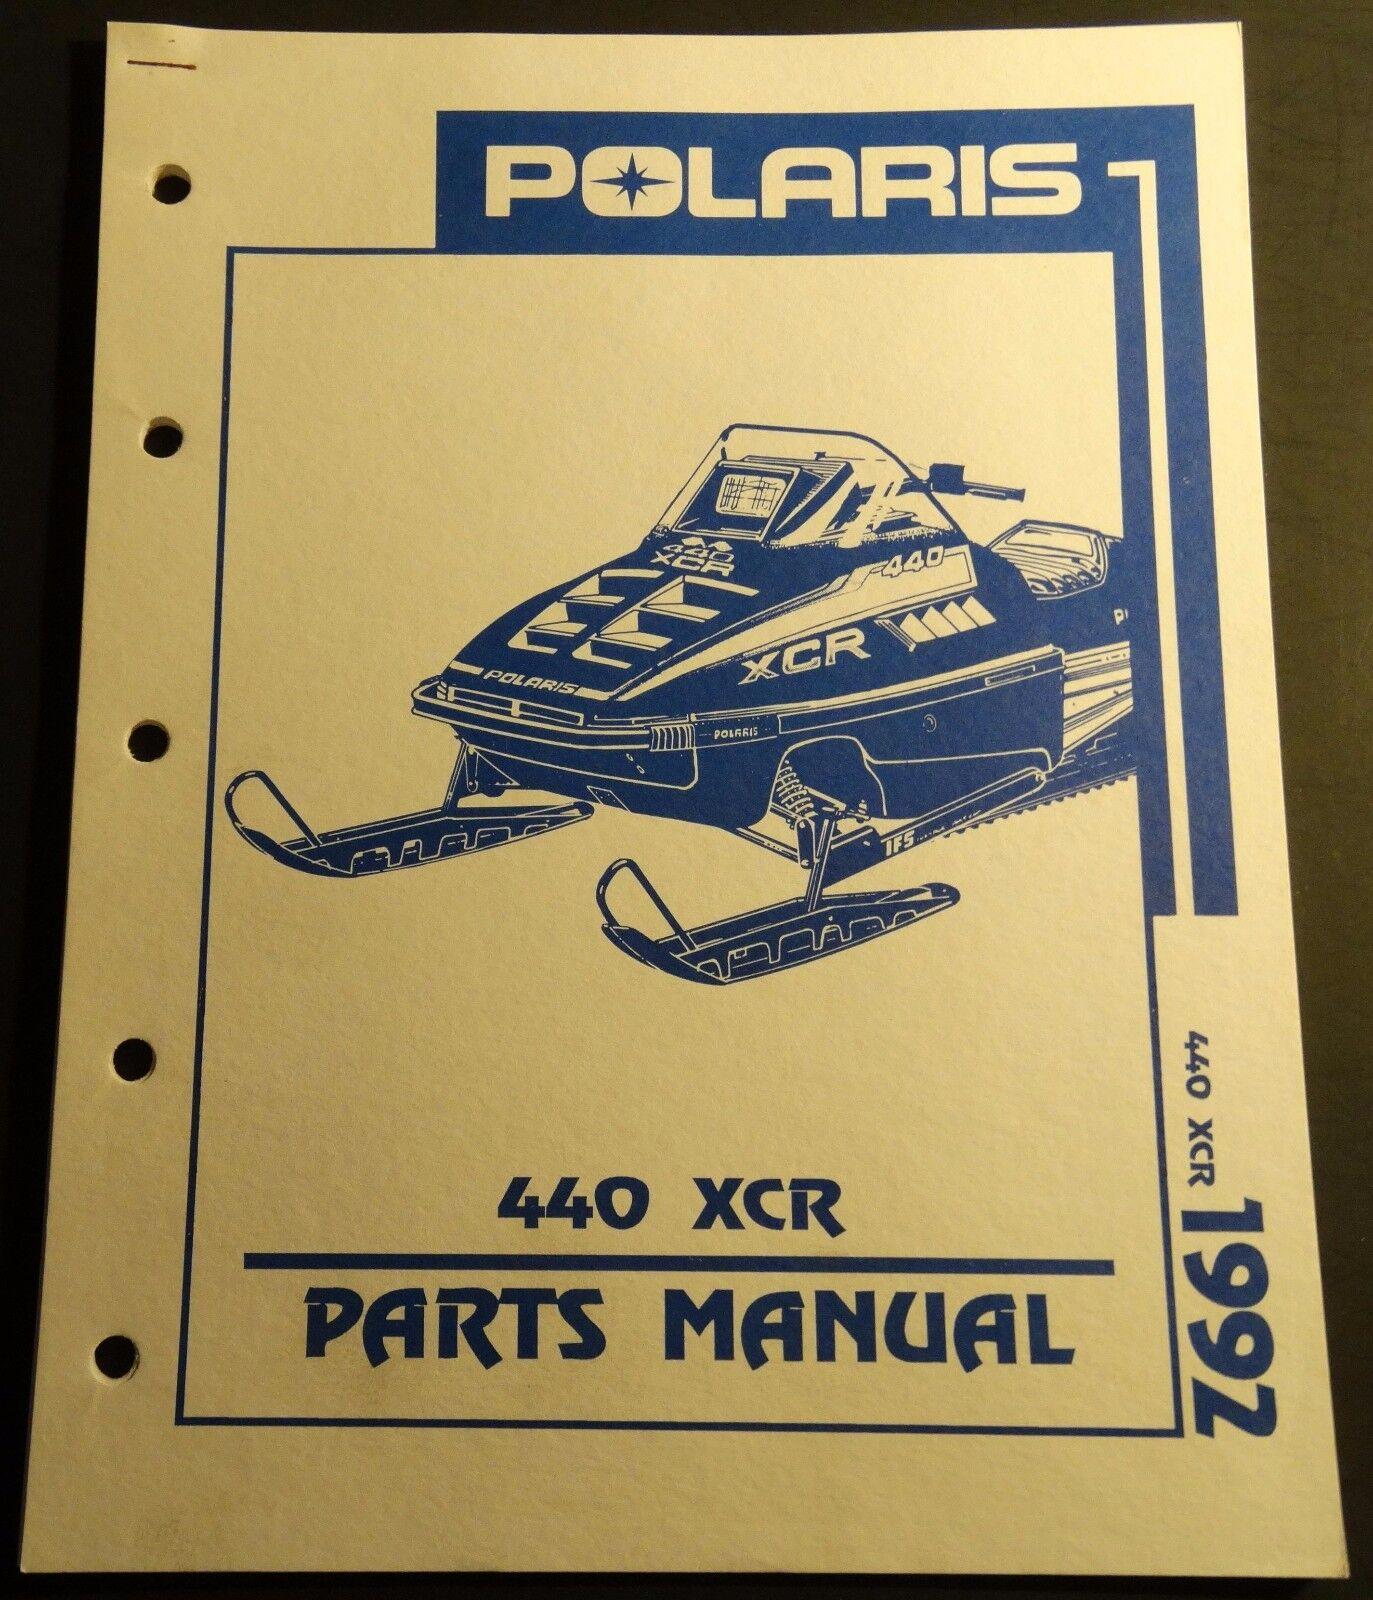 1992 POLARIS SNOWMOBILE 440 XCR PARTS  MANUAL NEW P N 9912135  (940)